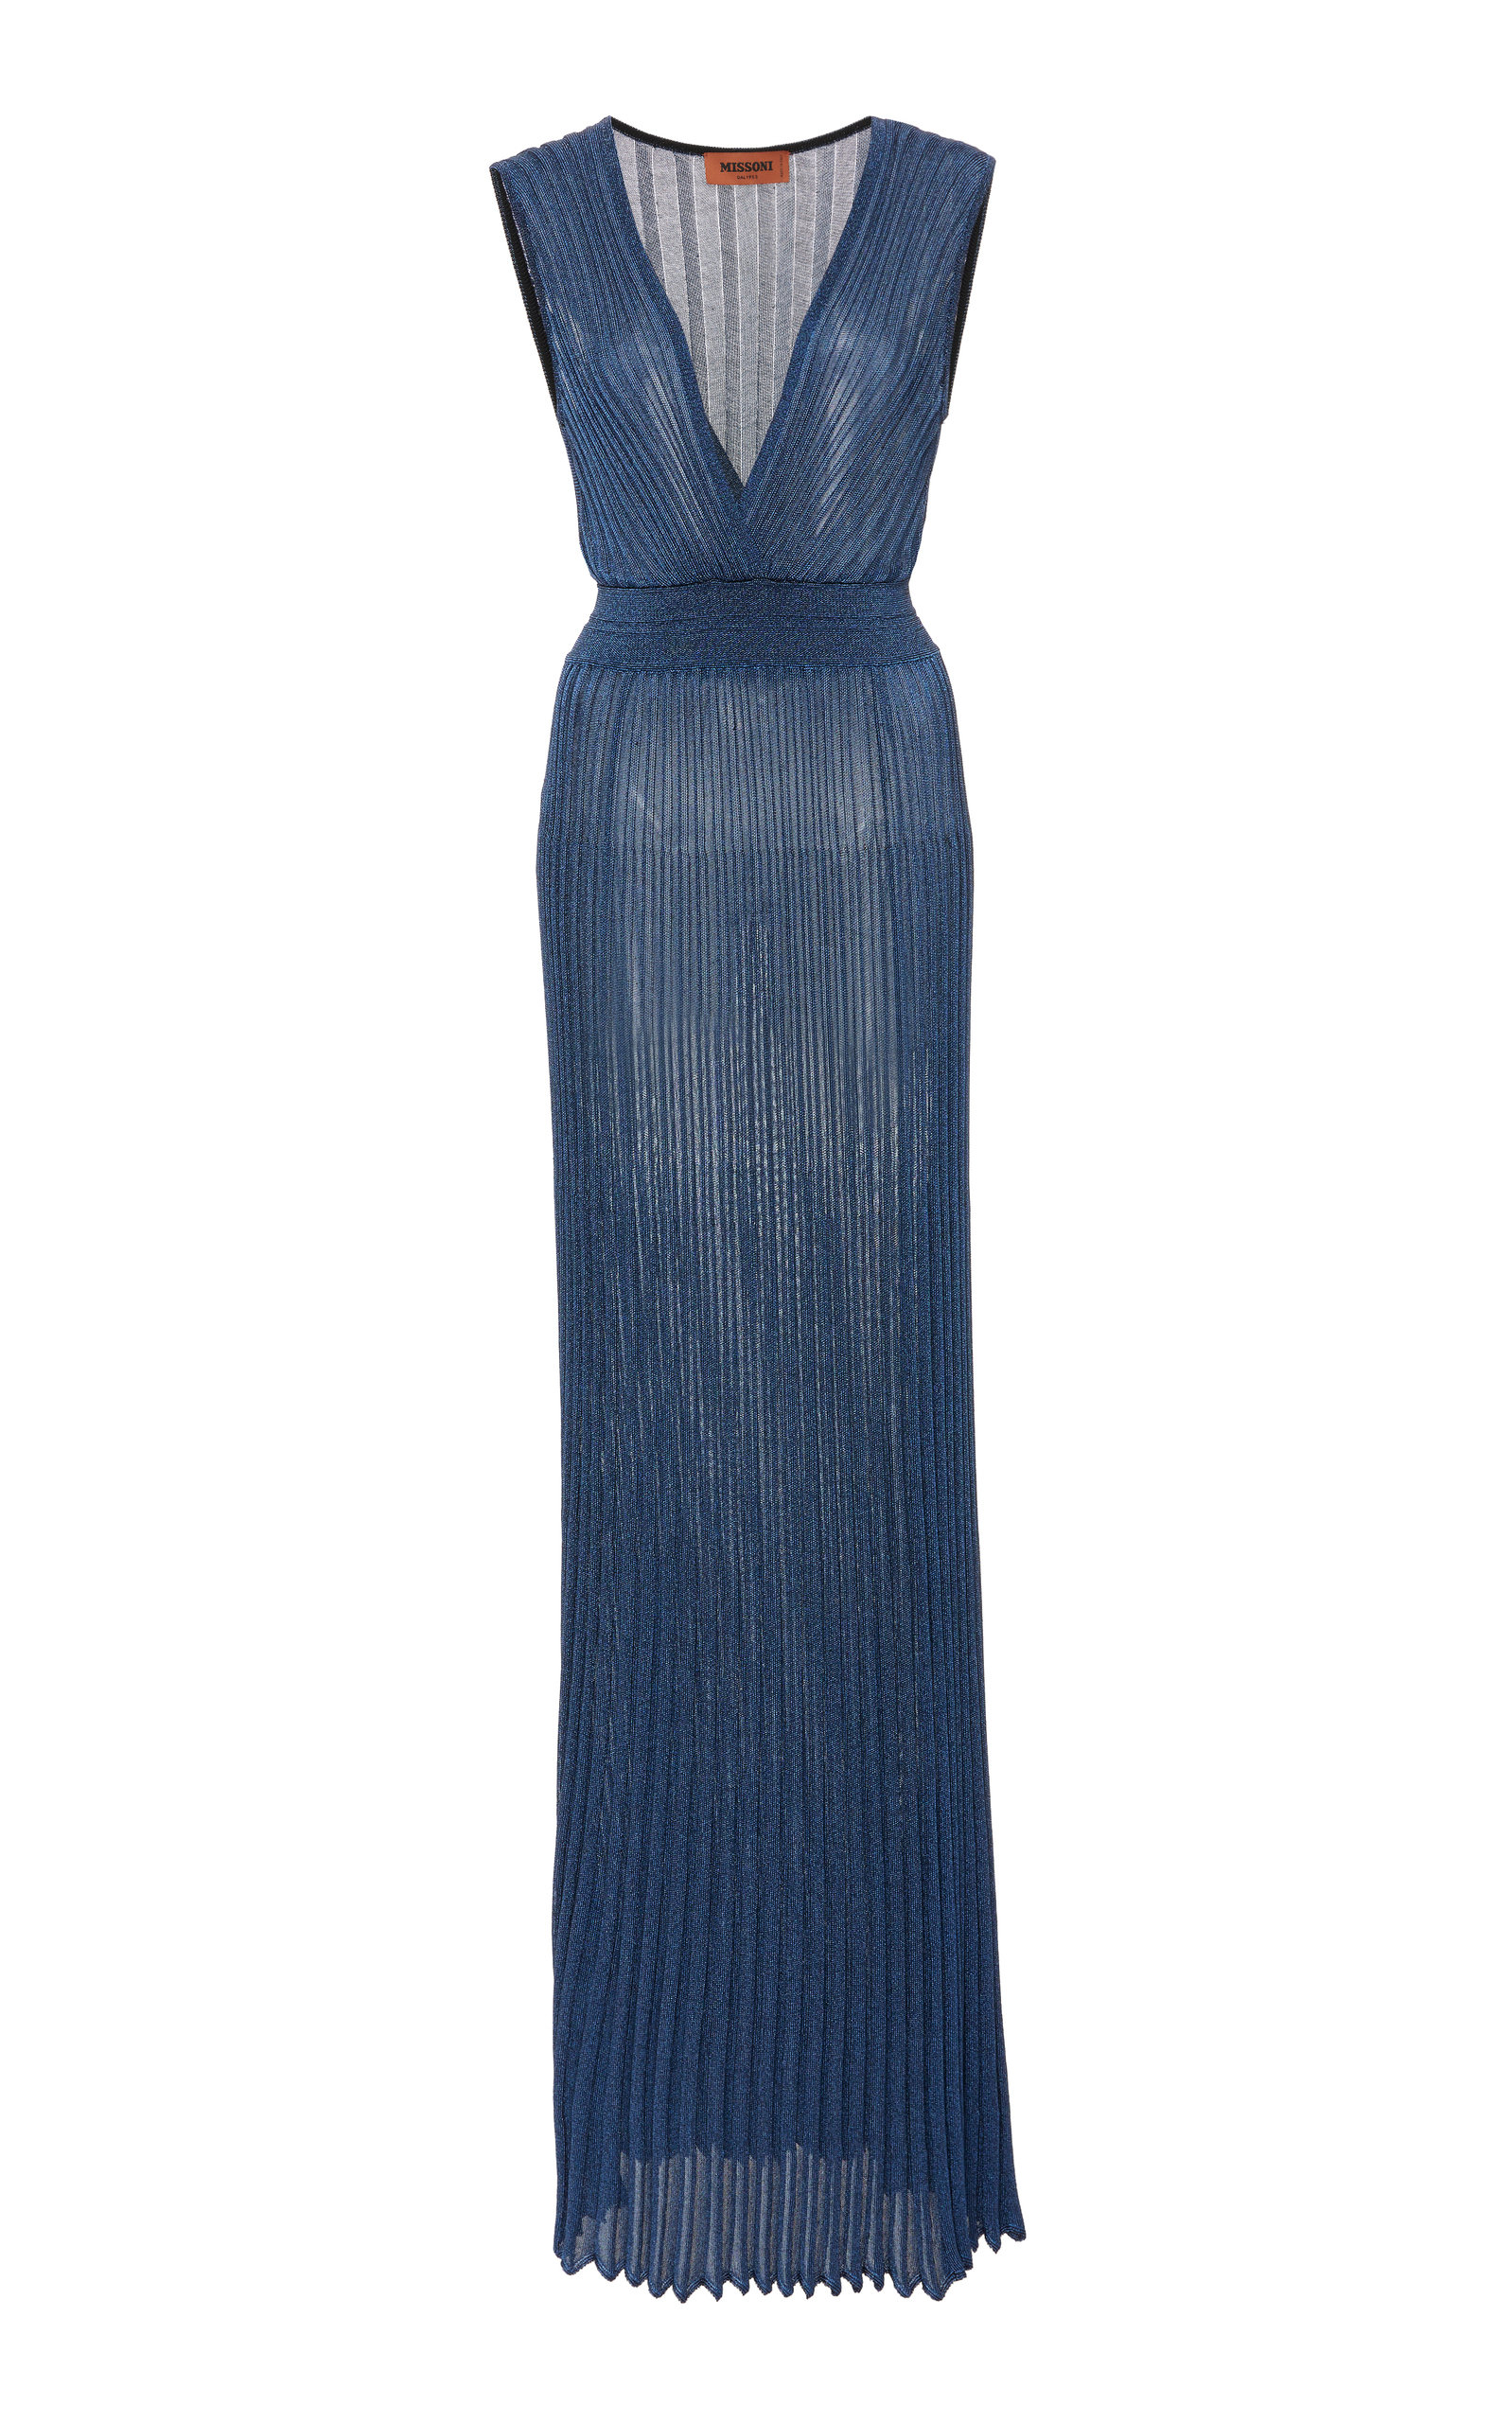 275a7877a70a9 Sleeveless Metallic Crochet-Knit Maxi Dress by Missoni | Moda Operandi